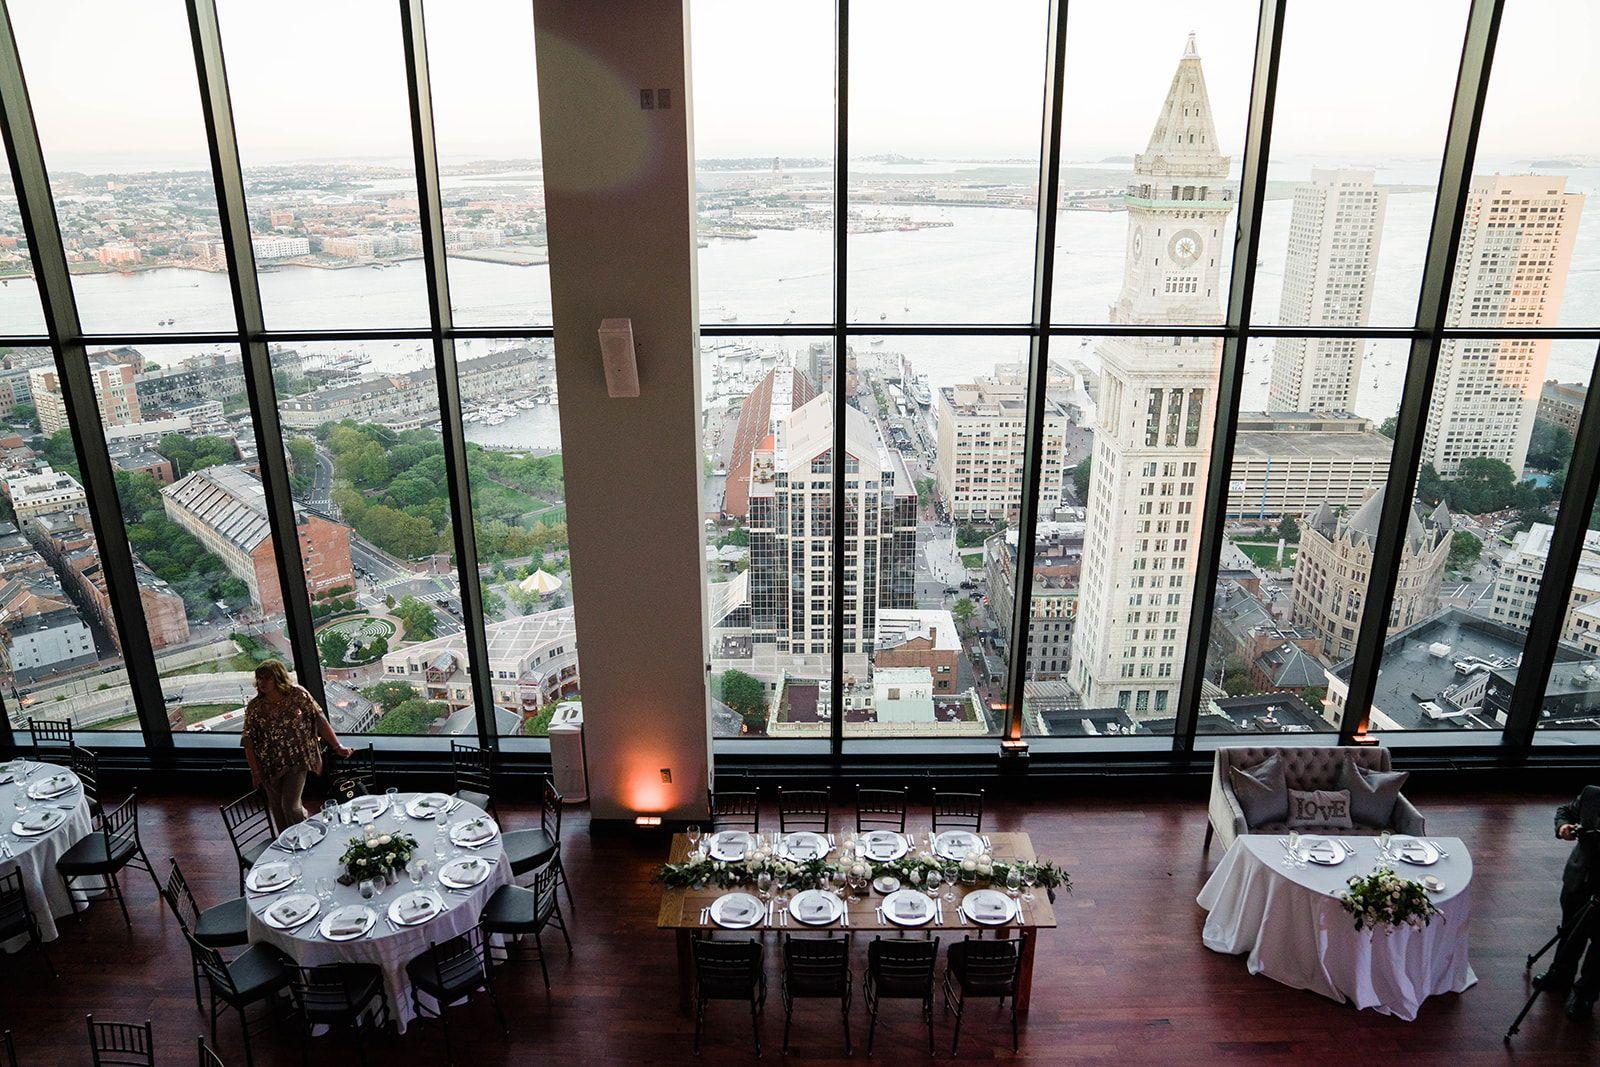 Real Boston Wedding At The State Room Boston Ma Longwood Venues Gina Brocker Photo Massachusetts Wedding Venues Boston Wedding Venues Wedding Themes Winter